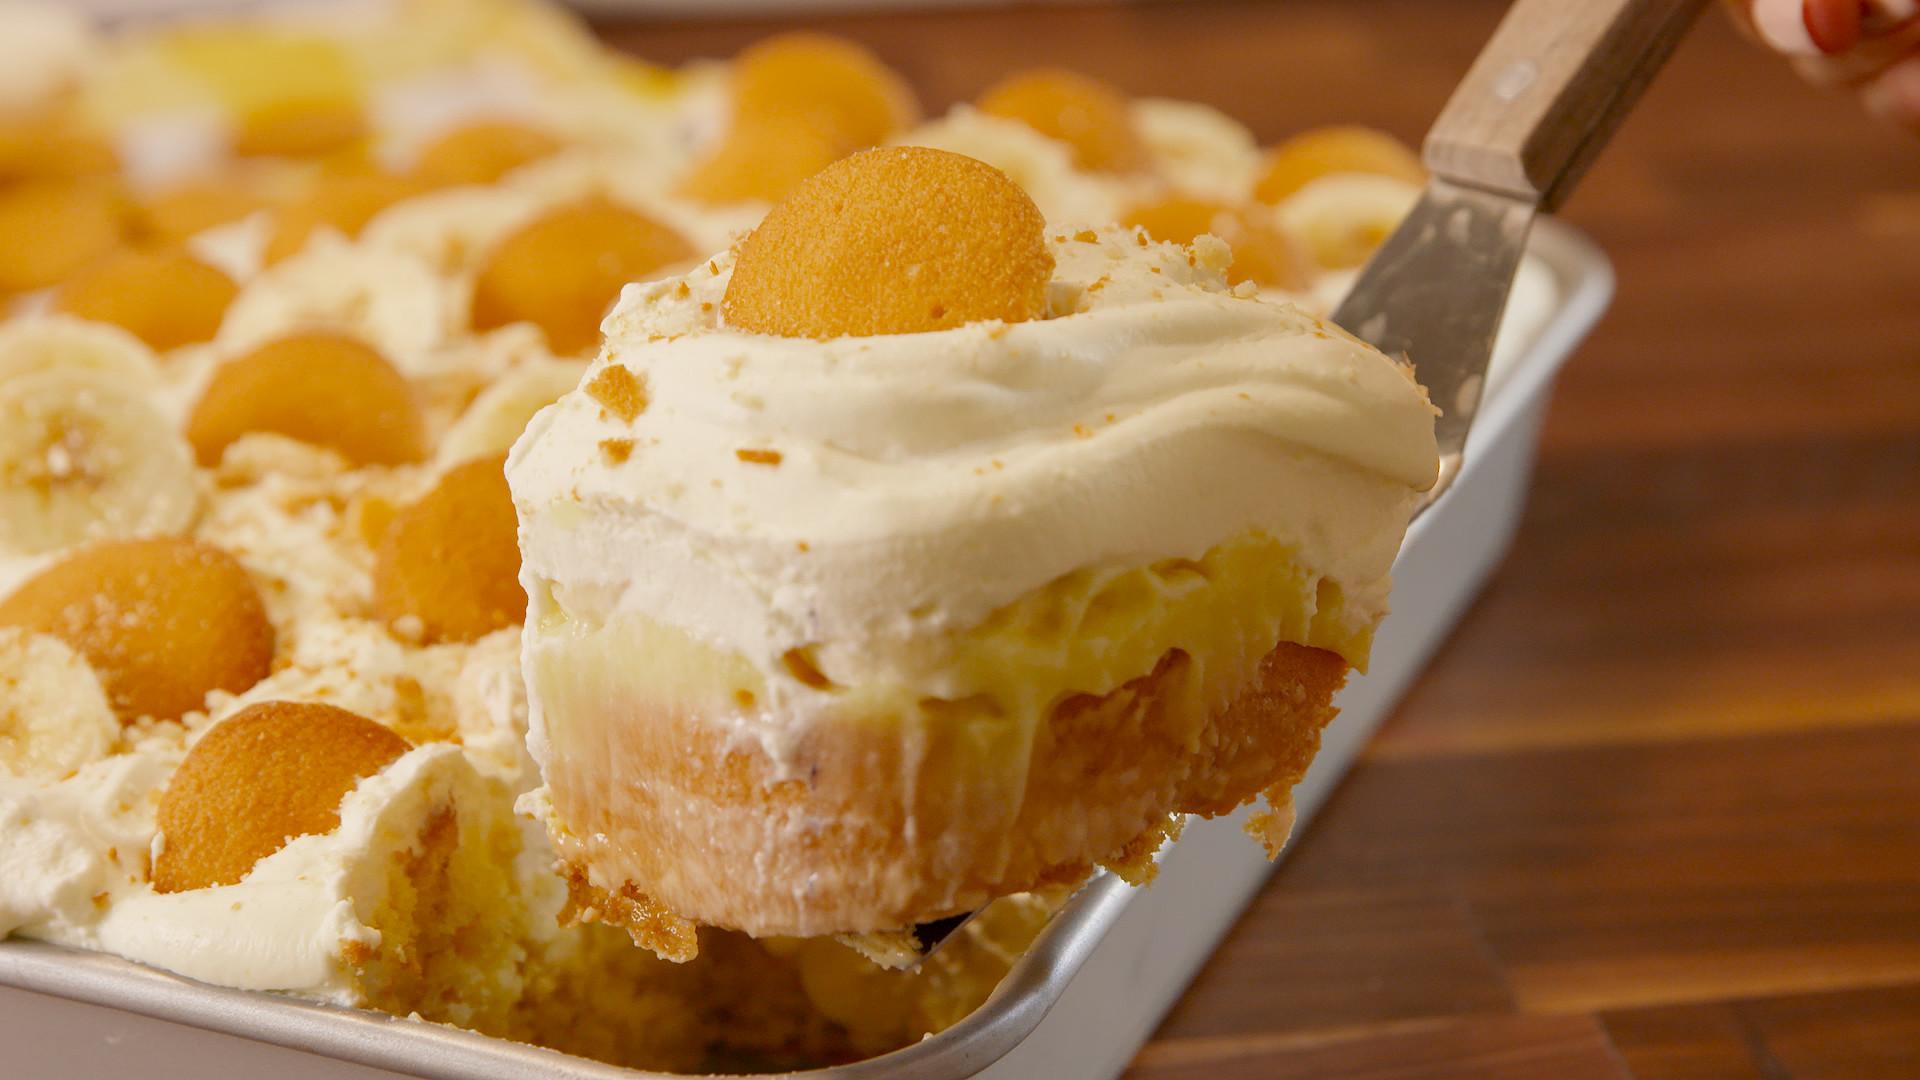 Easy Pudding Desserts  70 Easy Dessert Recipes – Ideas for Easiest Homemade